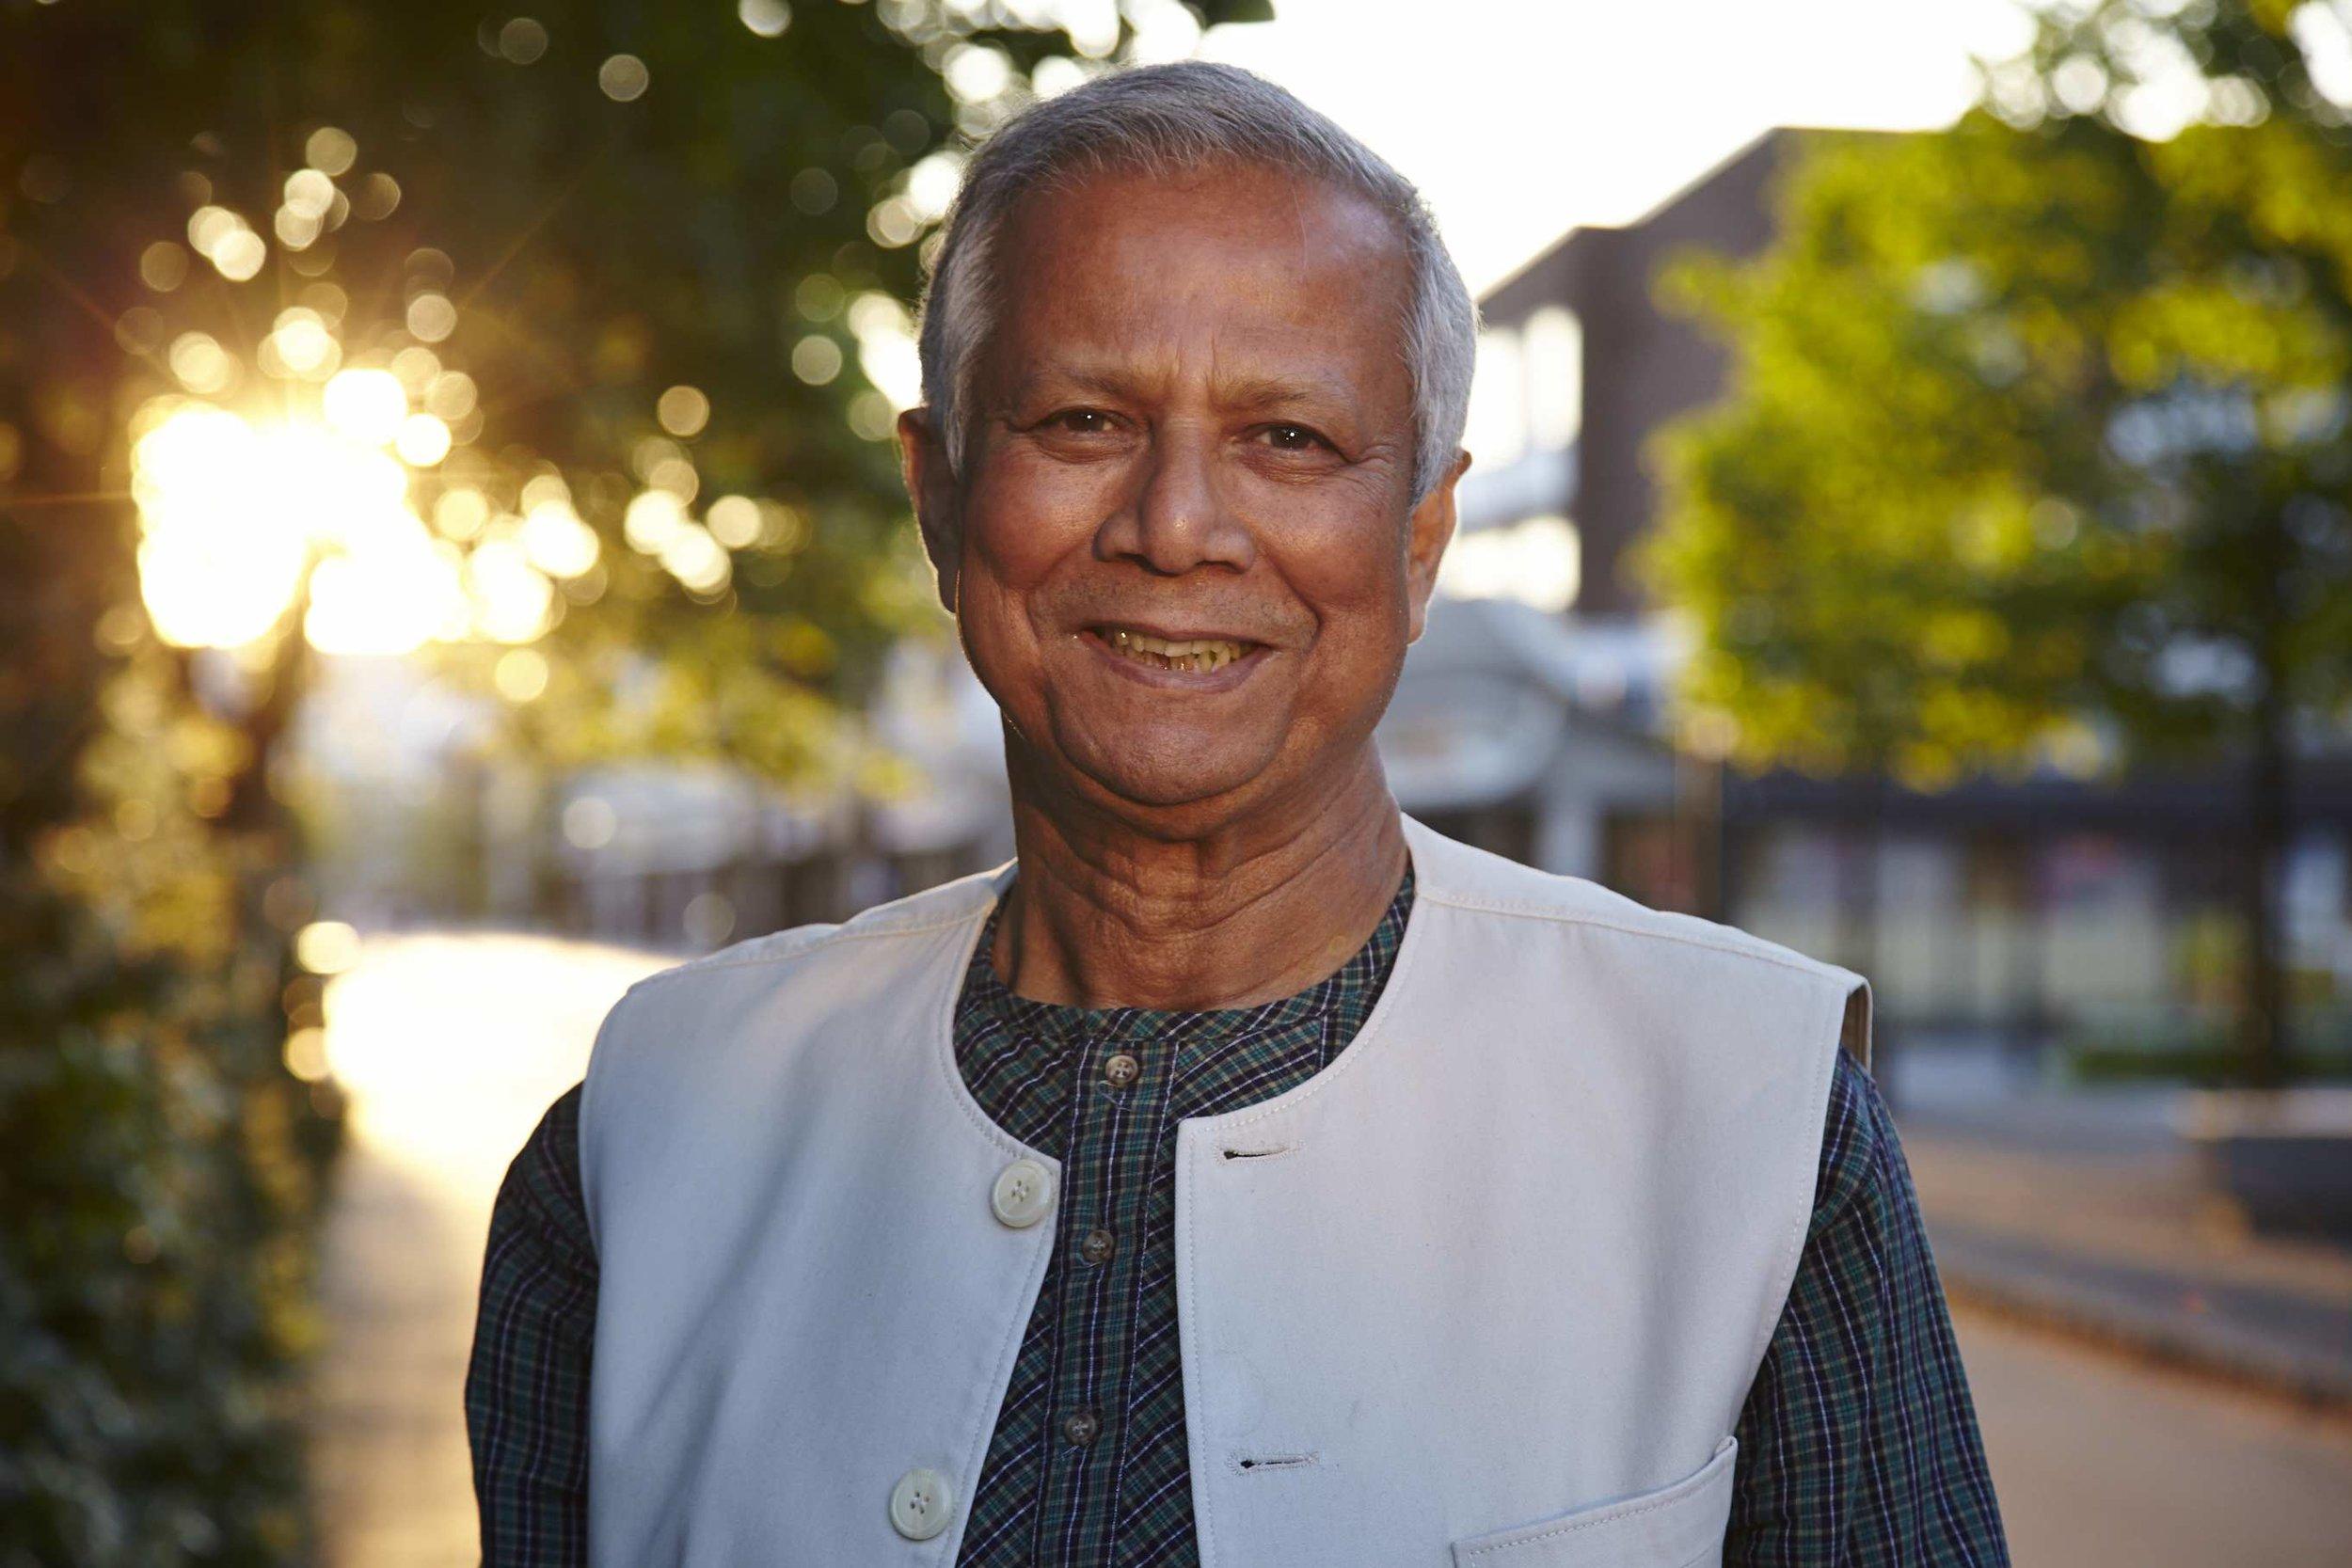 Professor Muhammad Yunus - Co-founder and Chairman